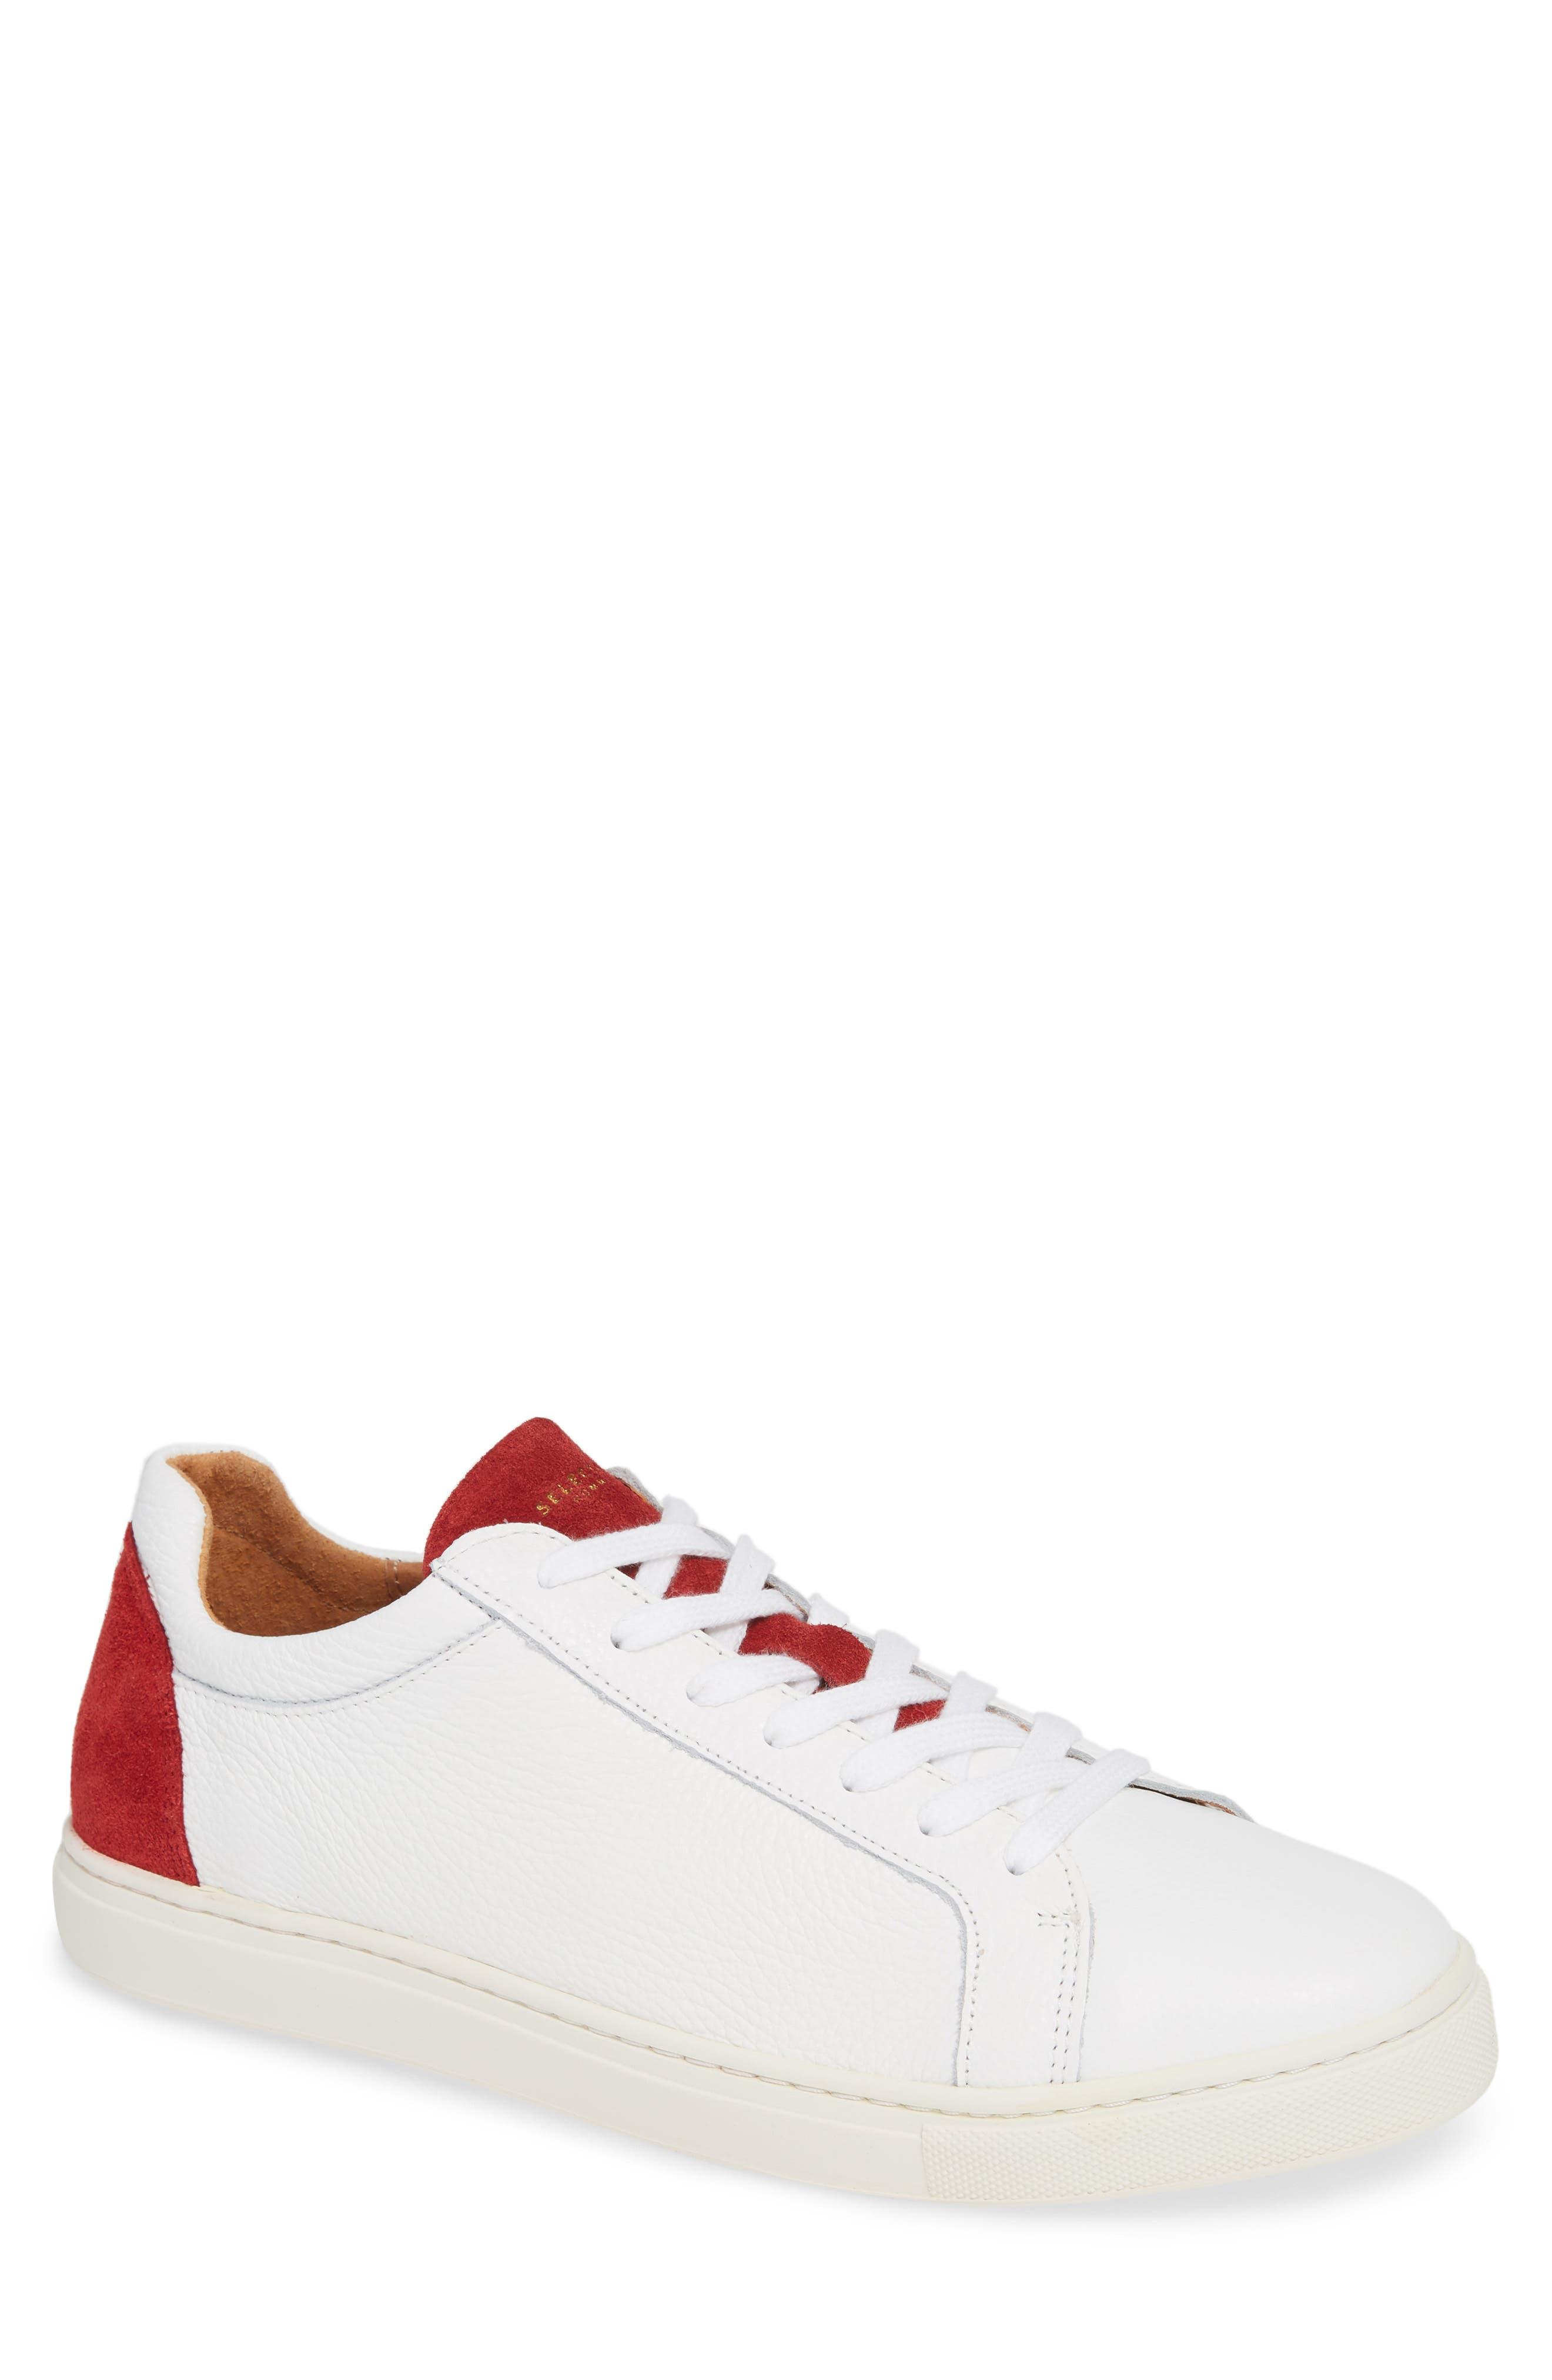 David Colorblock Sneaker,                         Main,                         color, WHITE/ BARBADOS CHERRY